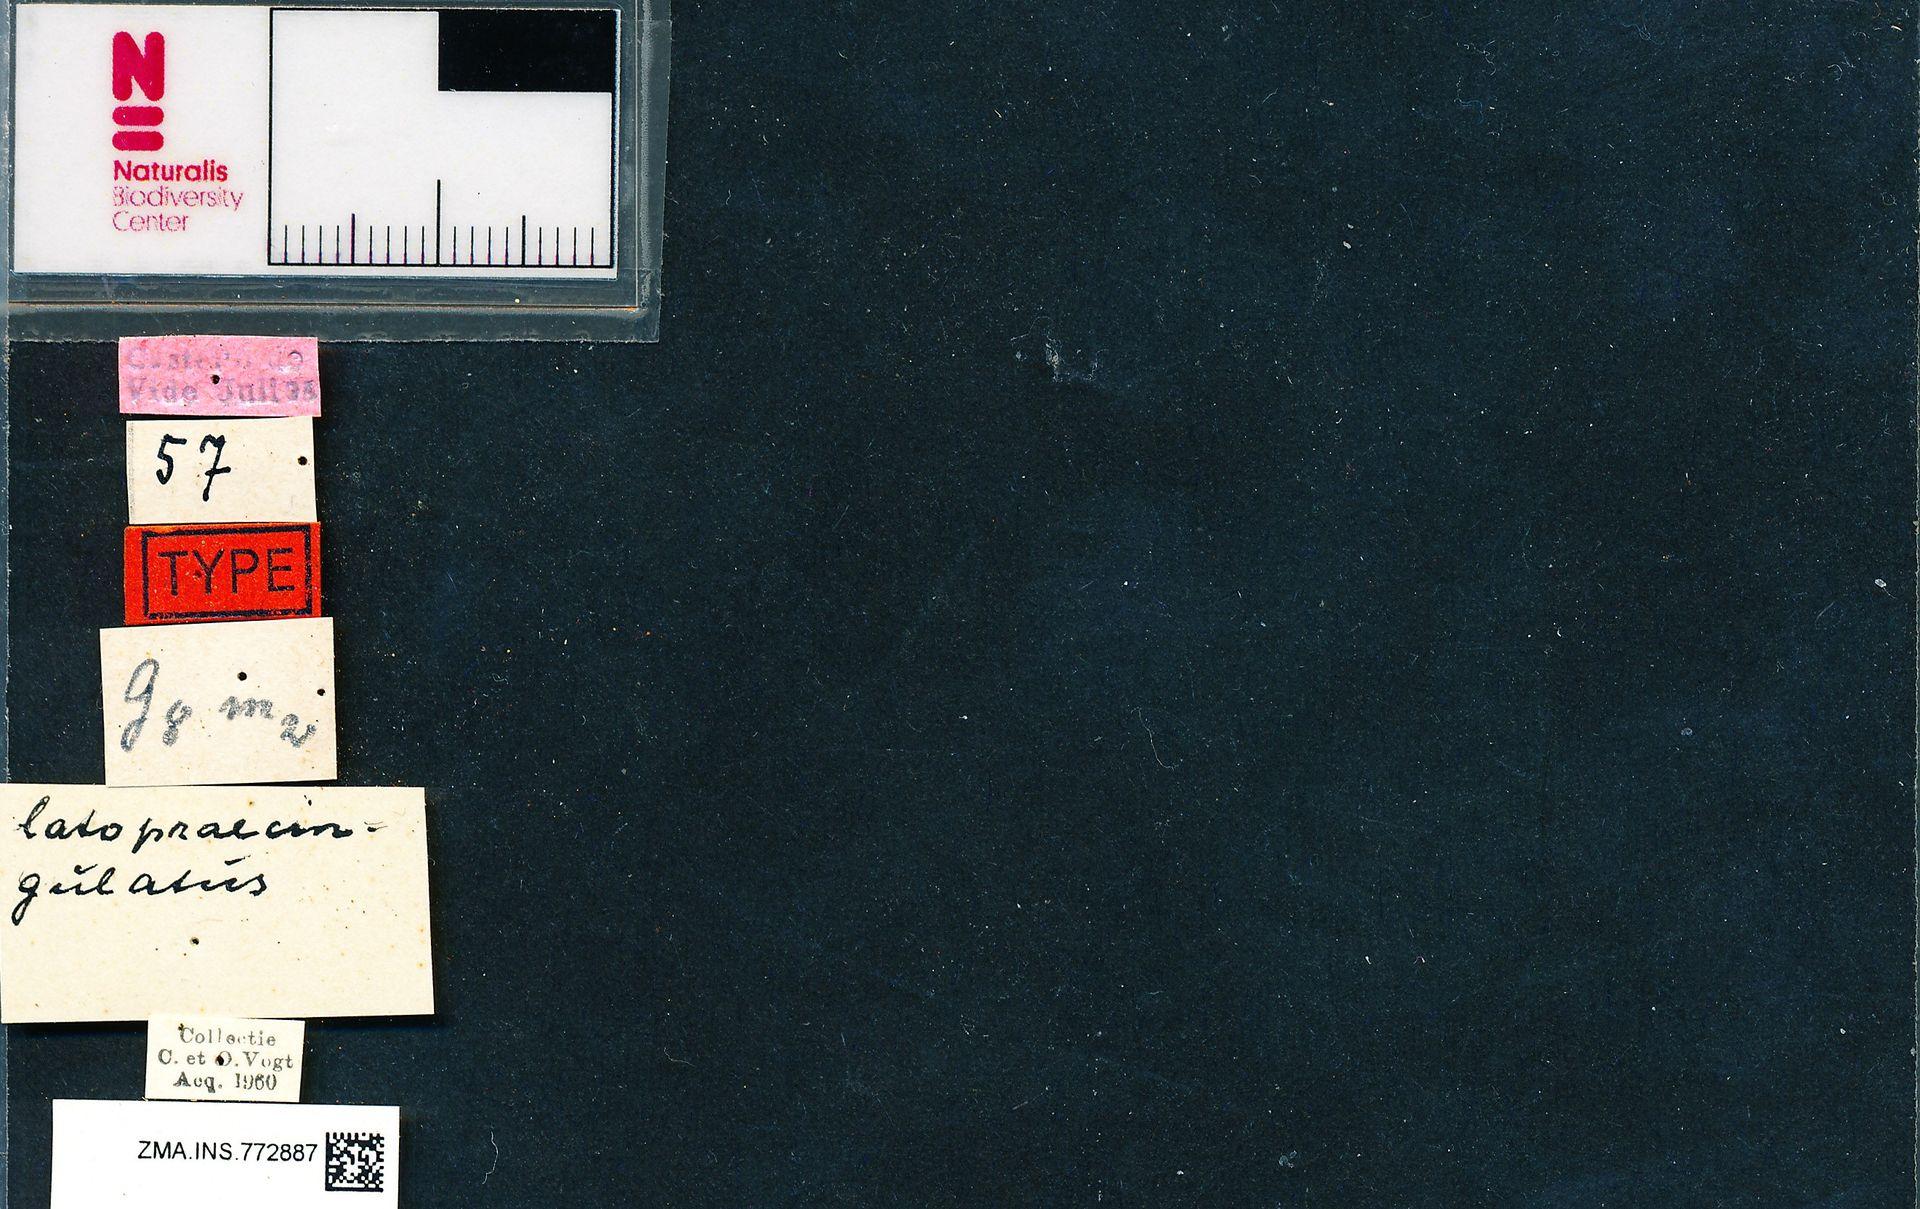 ZMA.INS.772887 | Bombus (Bombus) terrestris terrestris Krüger, 1954